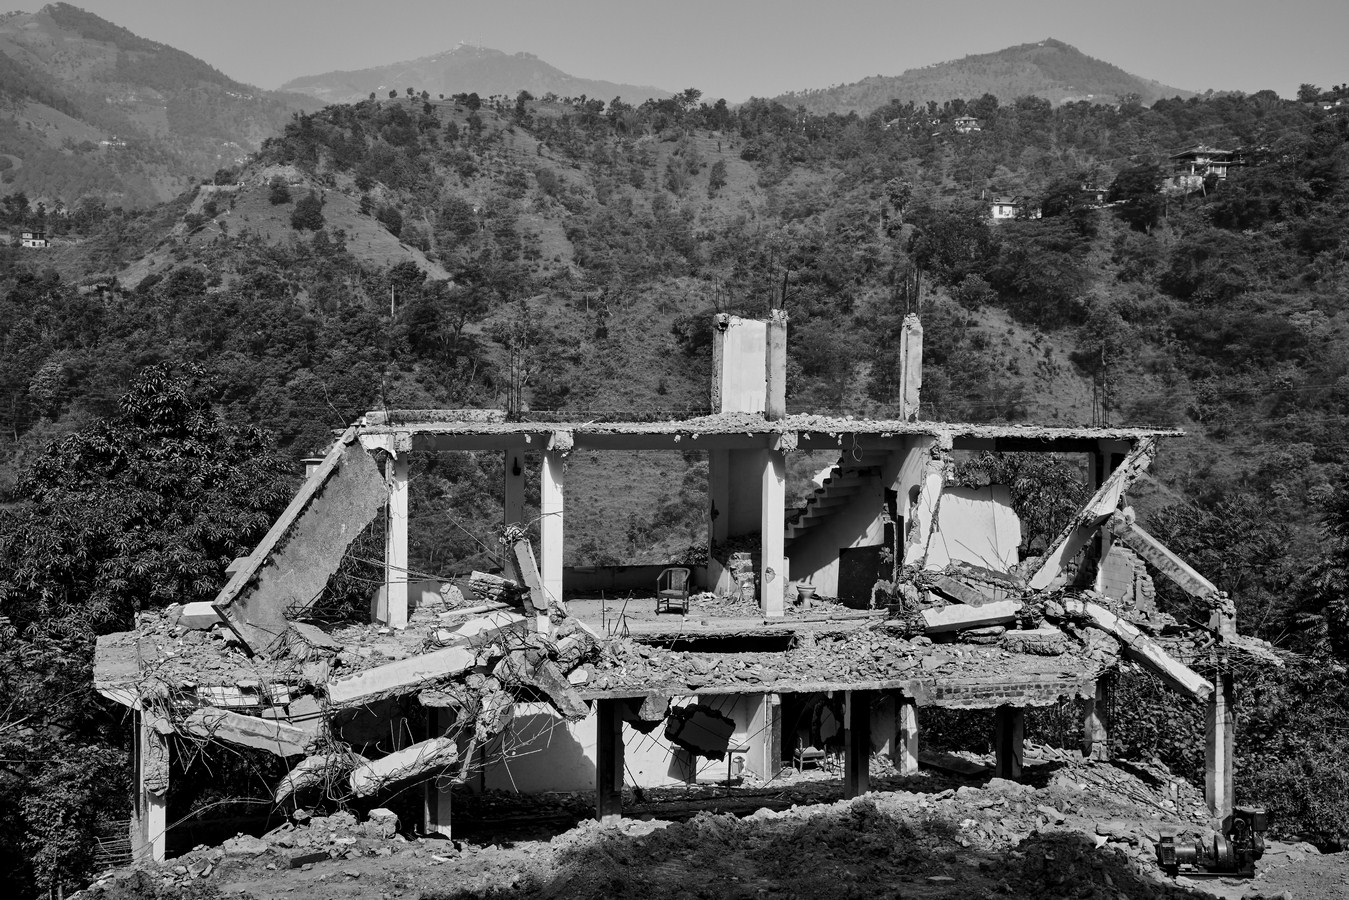 "Kund Village,Himachal Pradesh, India | Photograph |24"" x 36"" |2016"